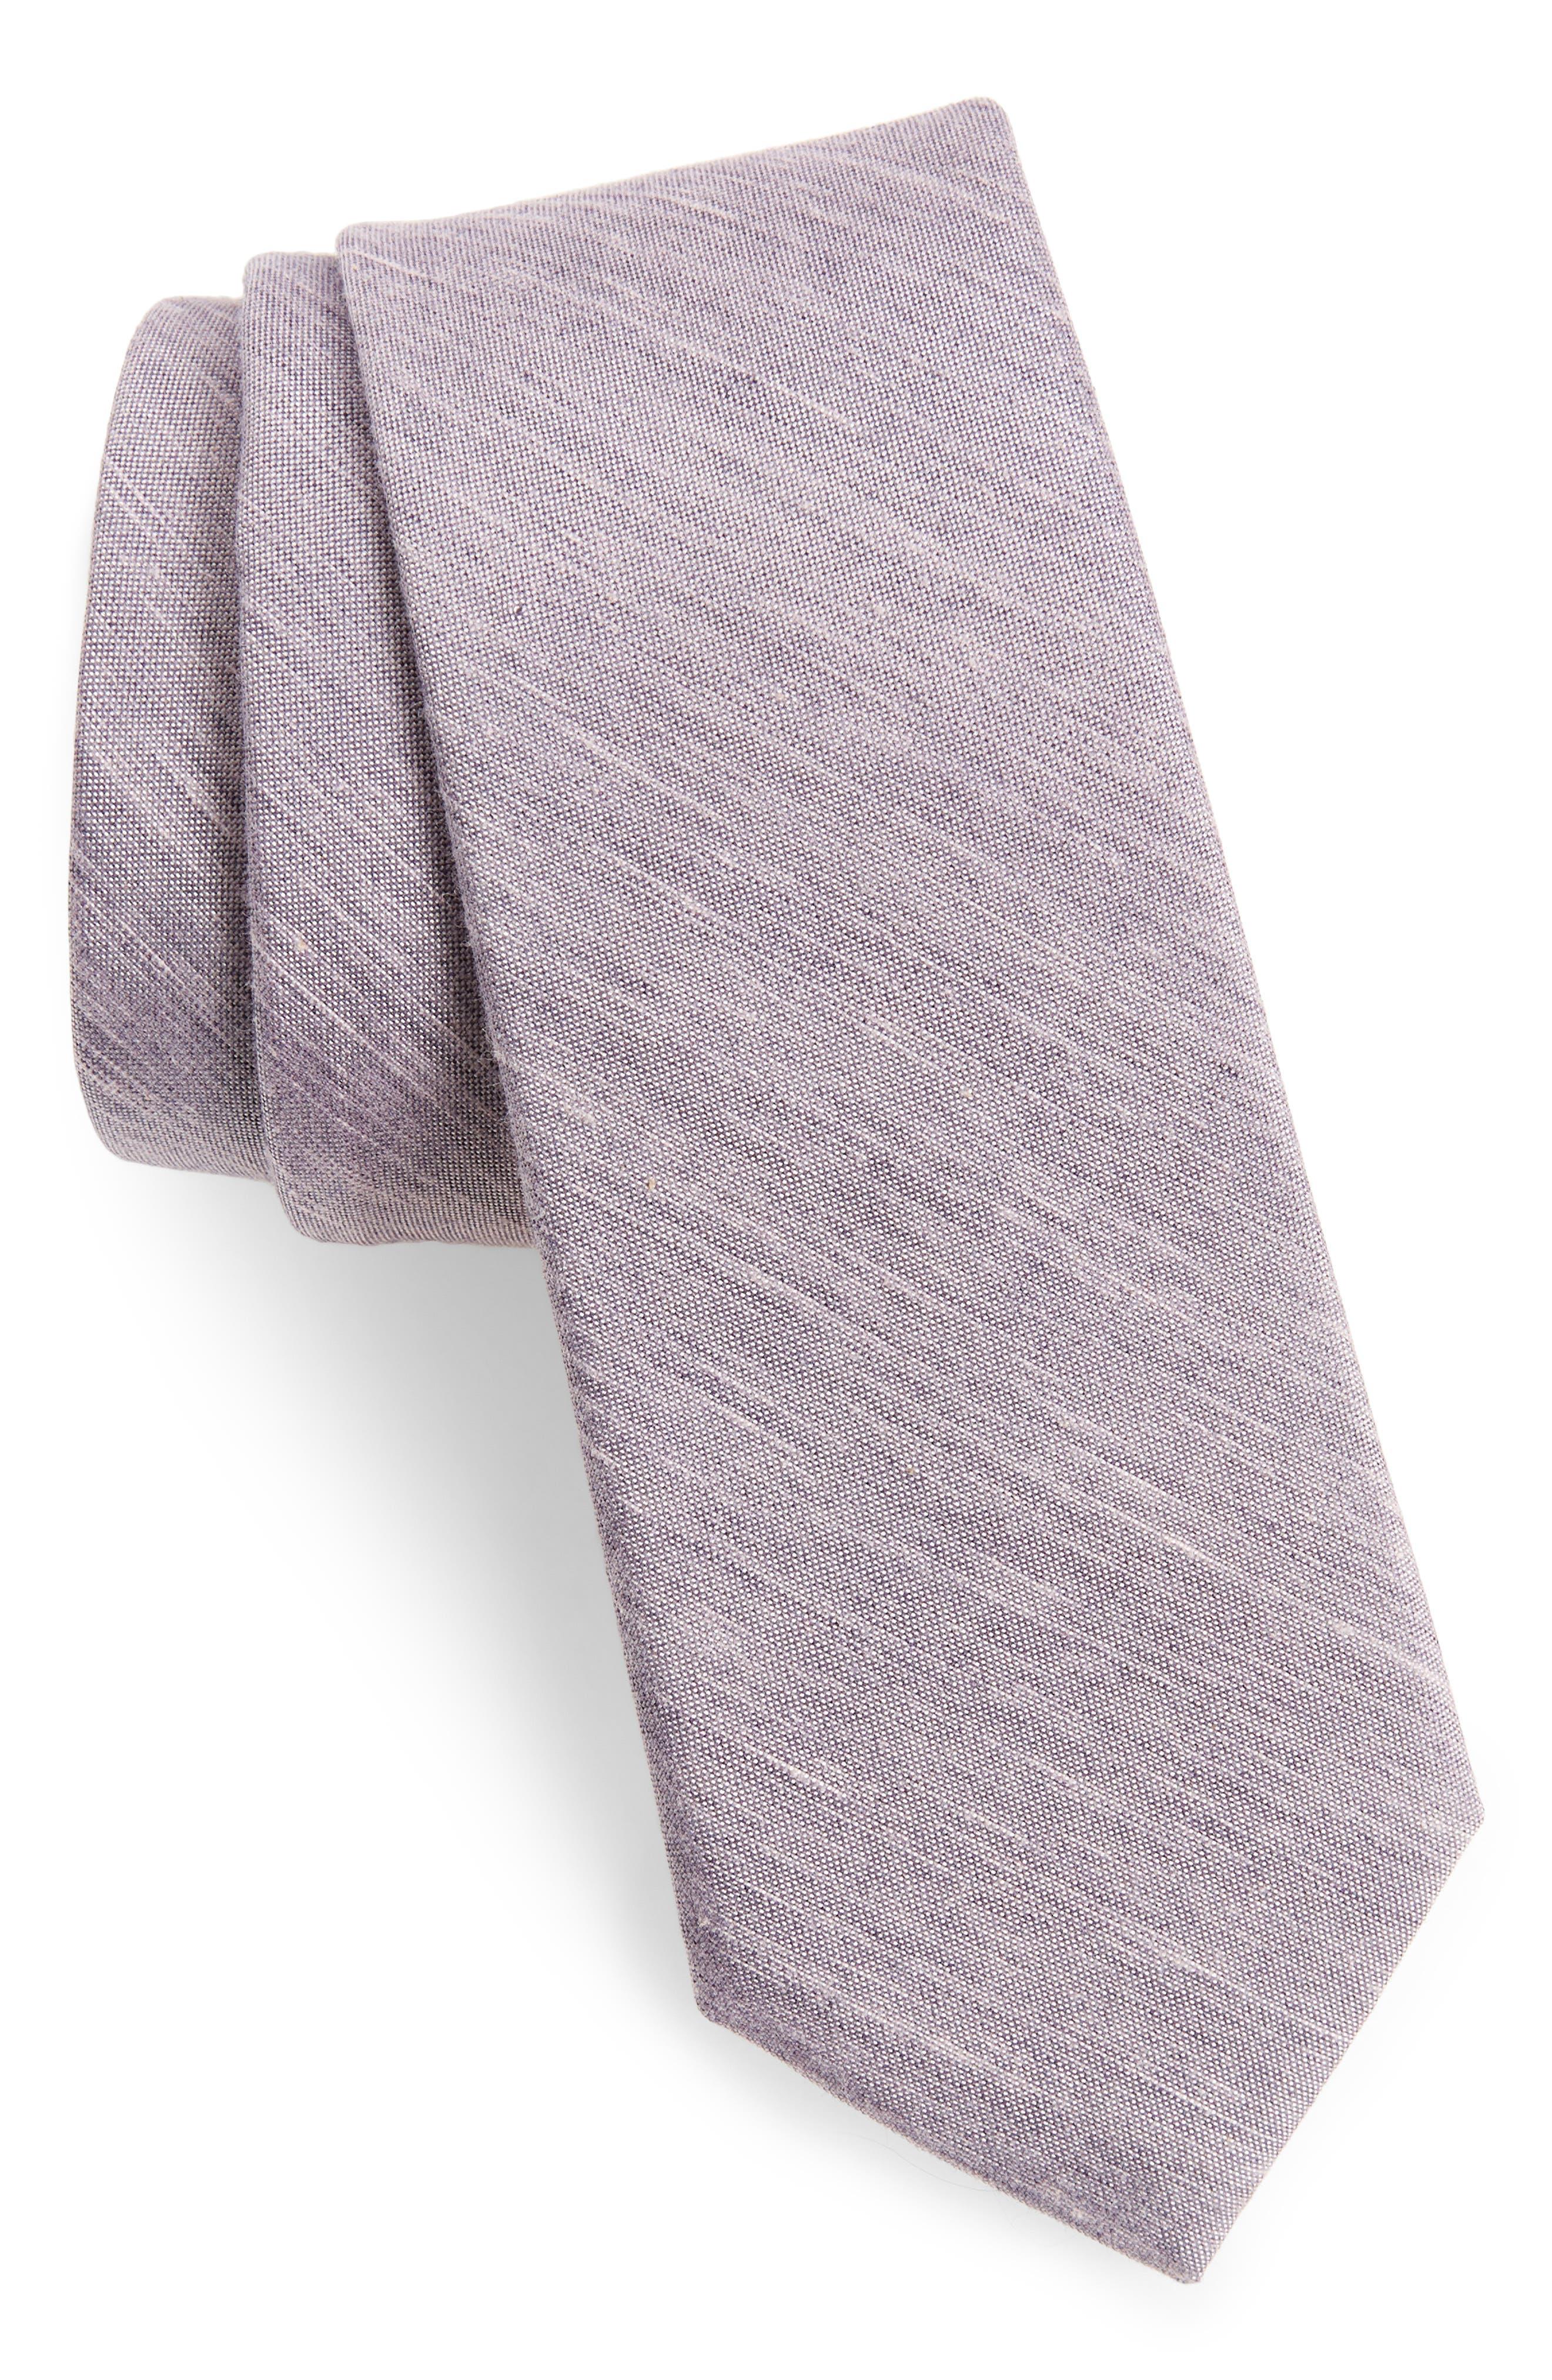 Marcus Solid Cotton Blend Tie,                             Main thumbnail 1, color,                             Charcoal